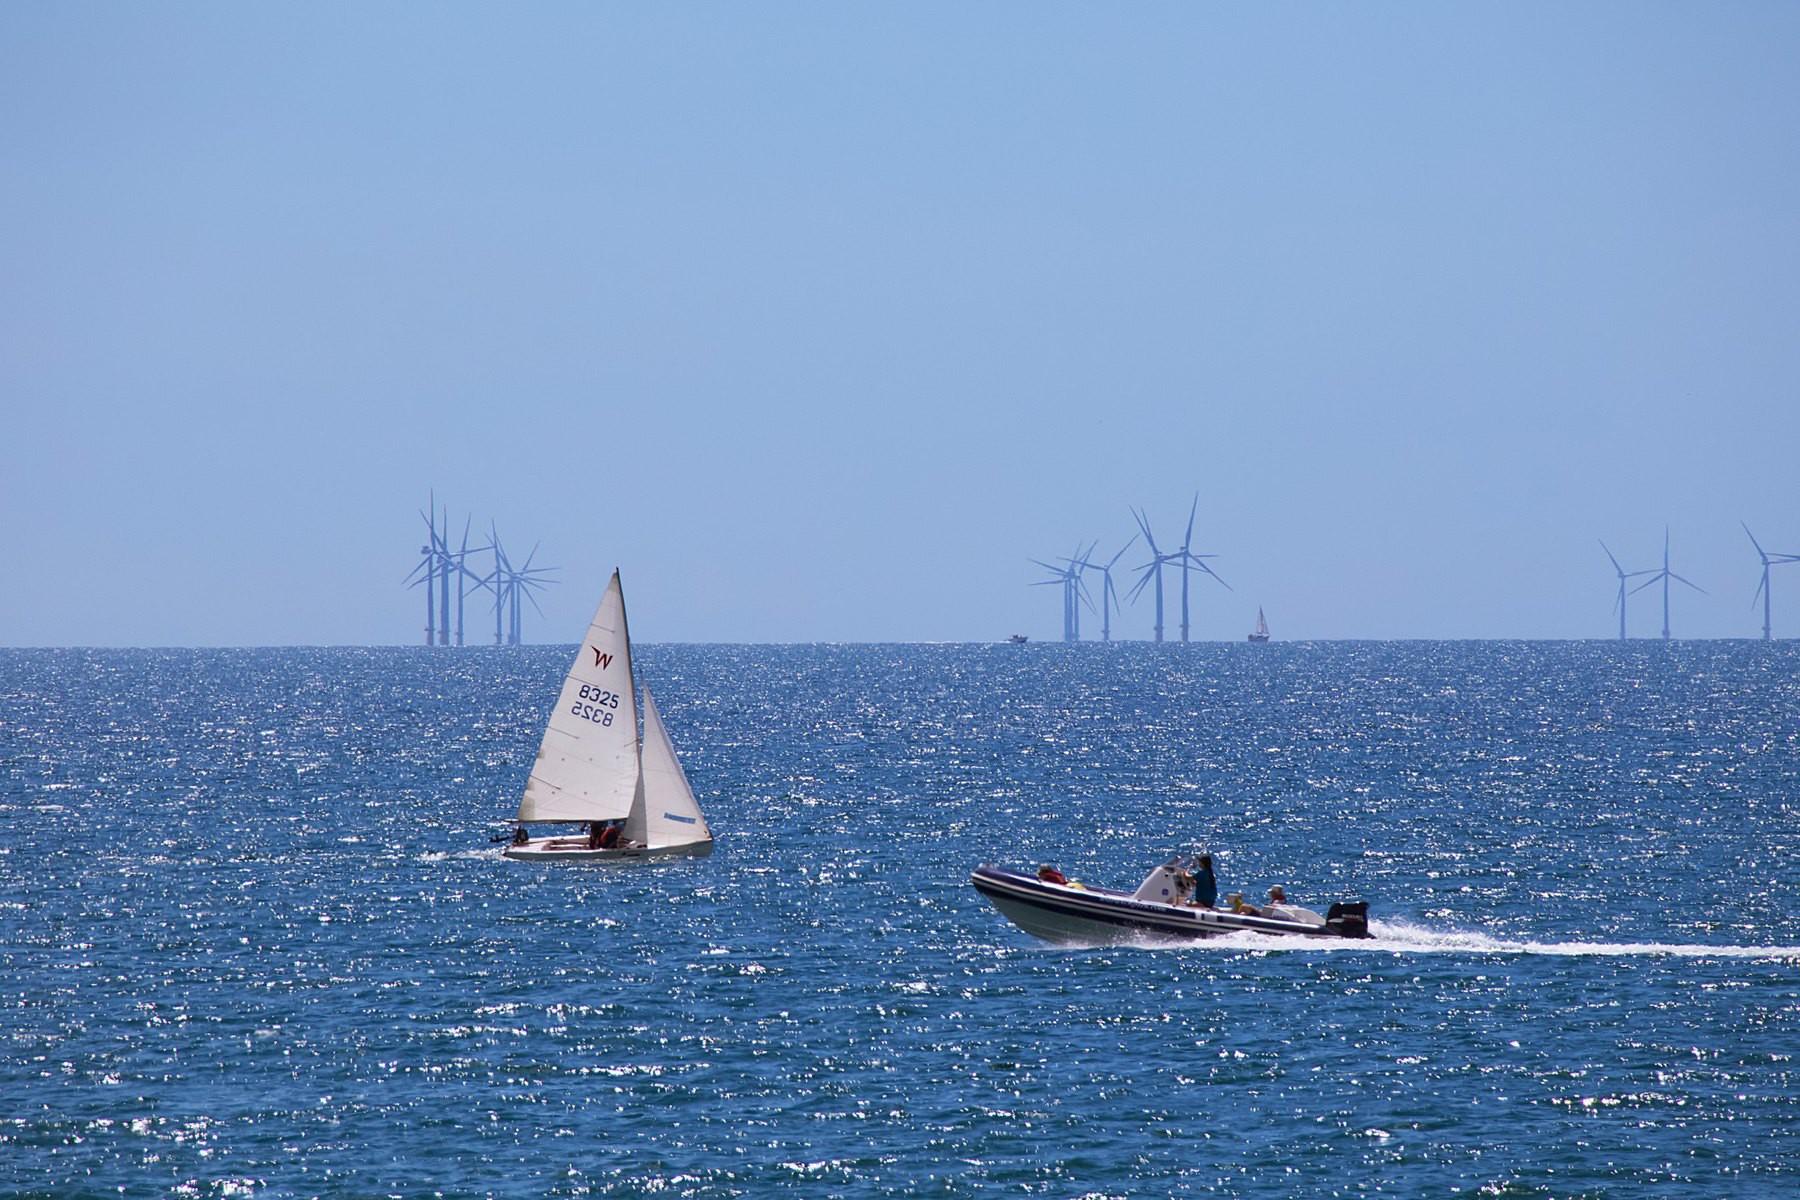 Various boats off Shoreham Beach, with Rampion wind farm on the horizon.